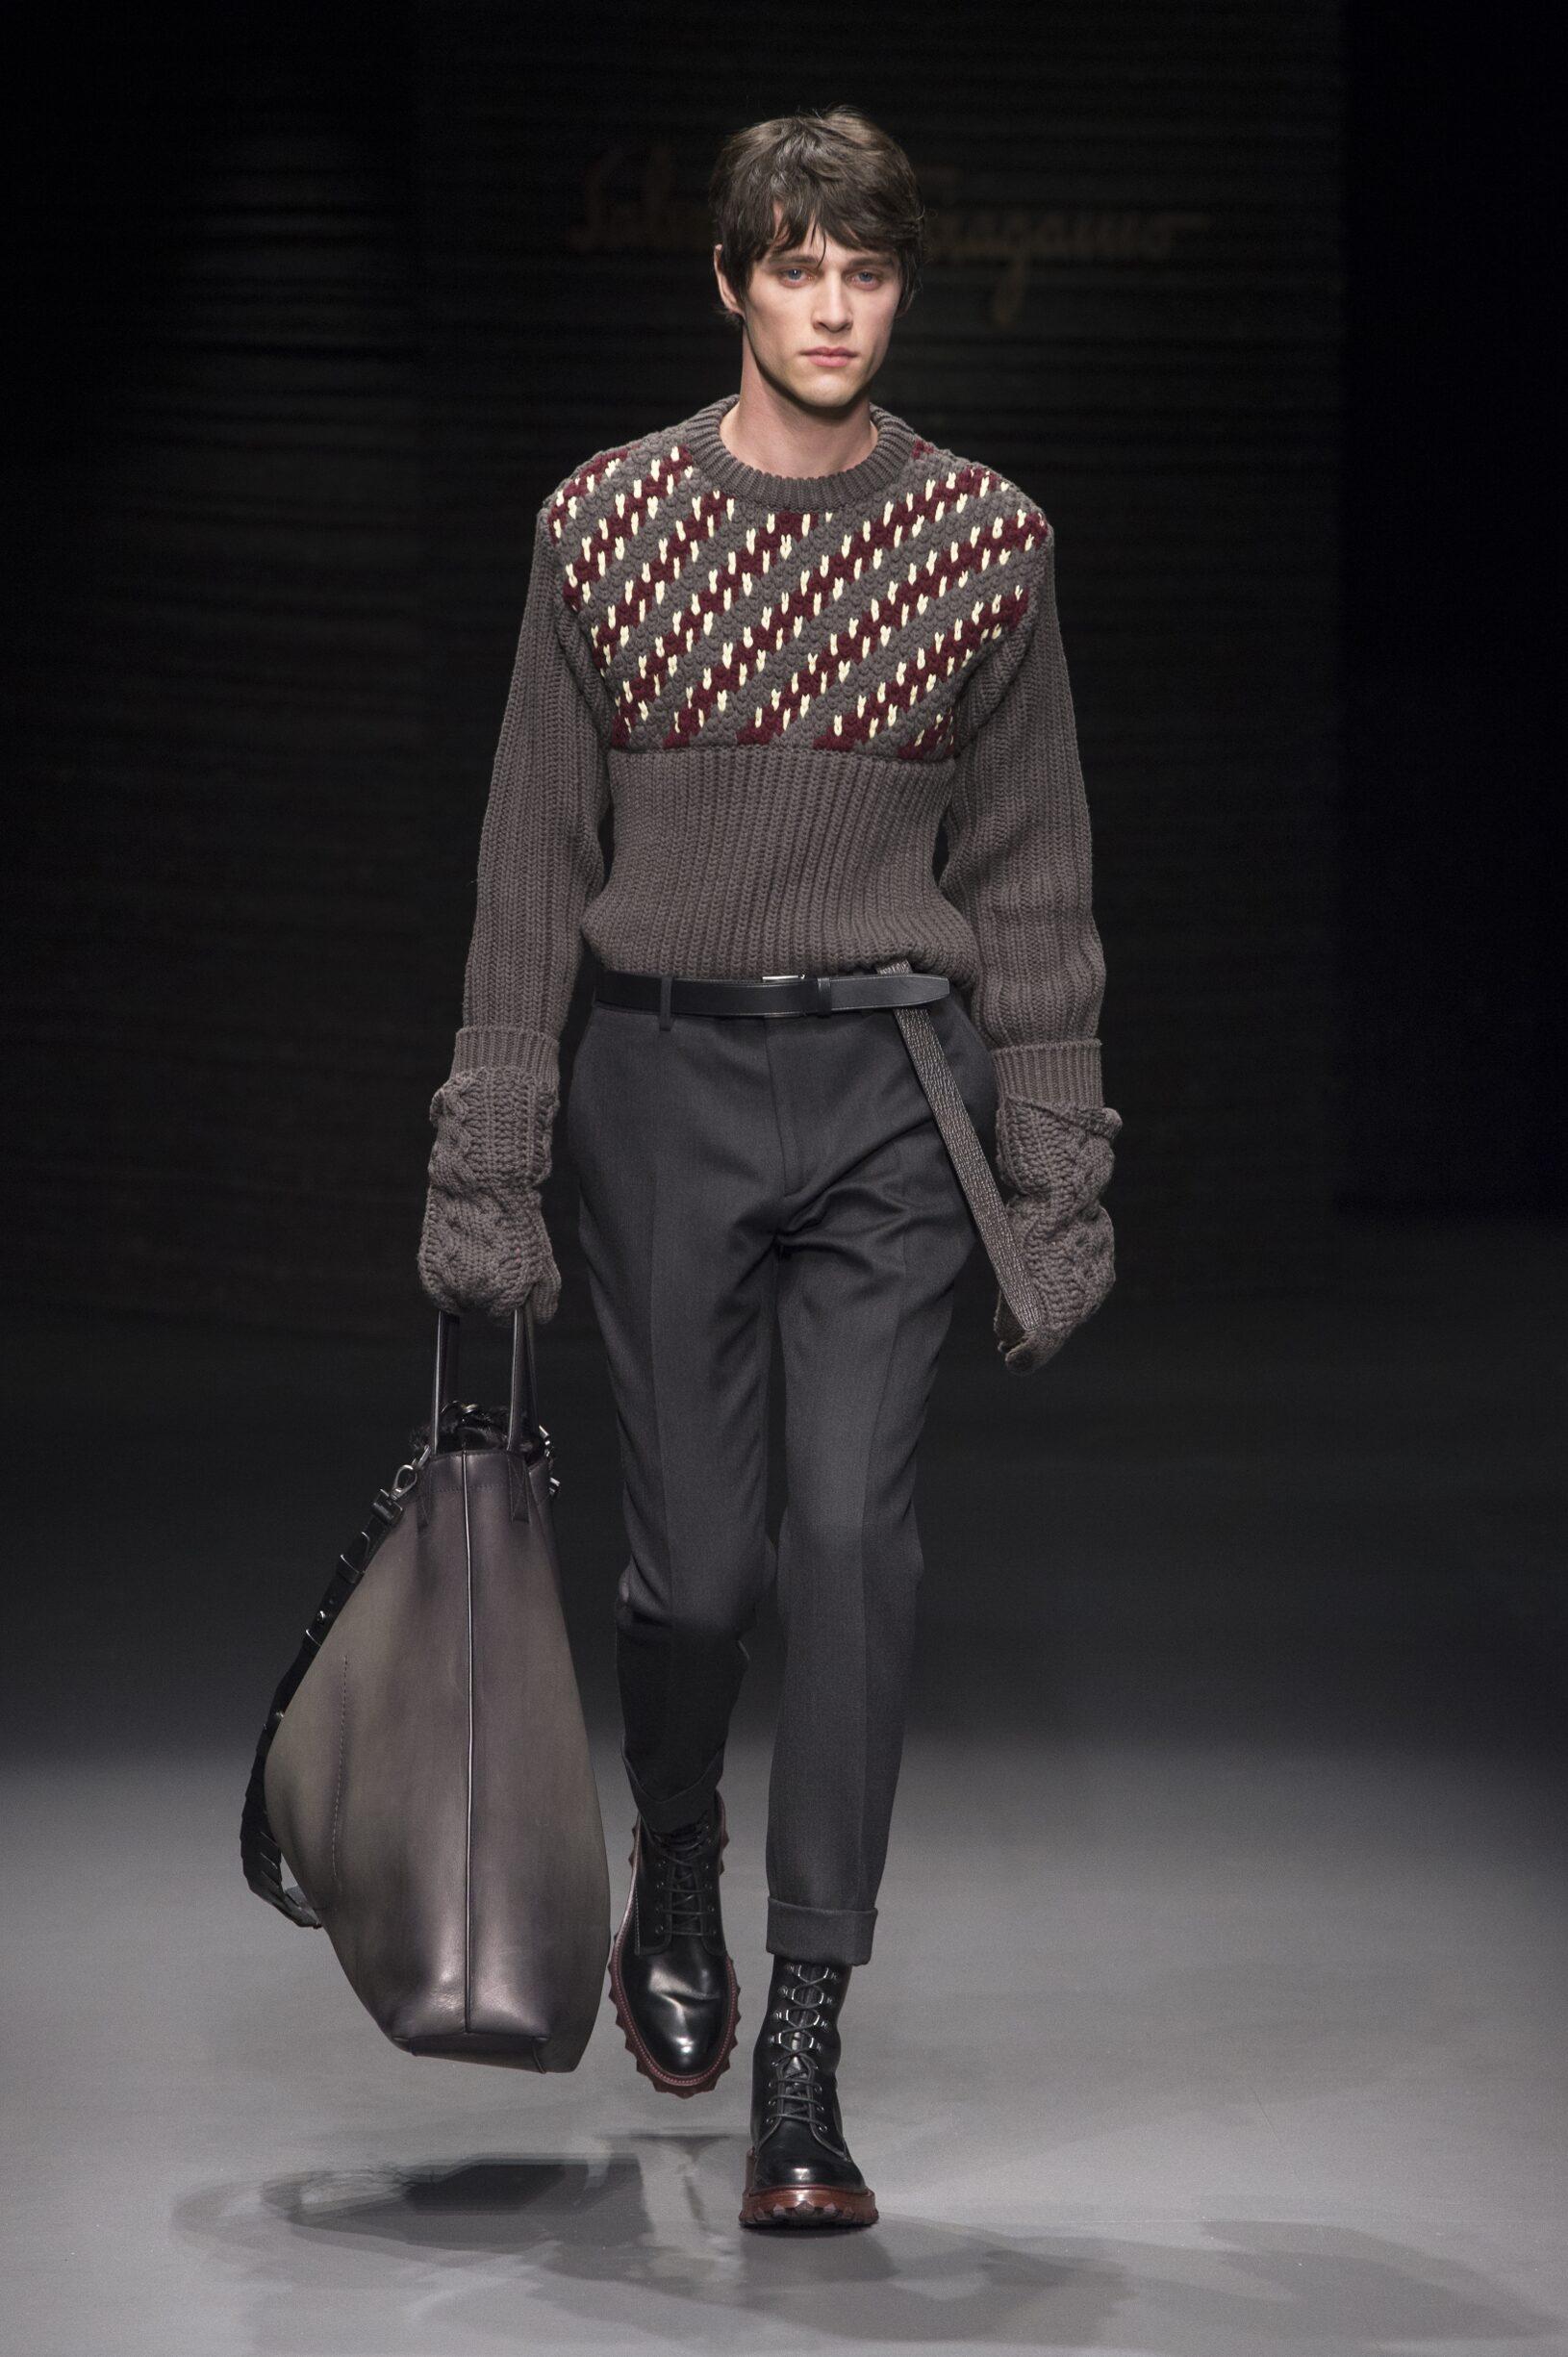 Runway Salvatore Ferragamo Fall Winter 2017 Men's Collection Milan Fashion Week